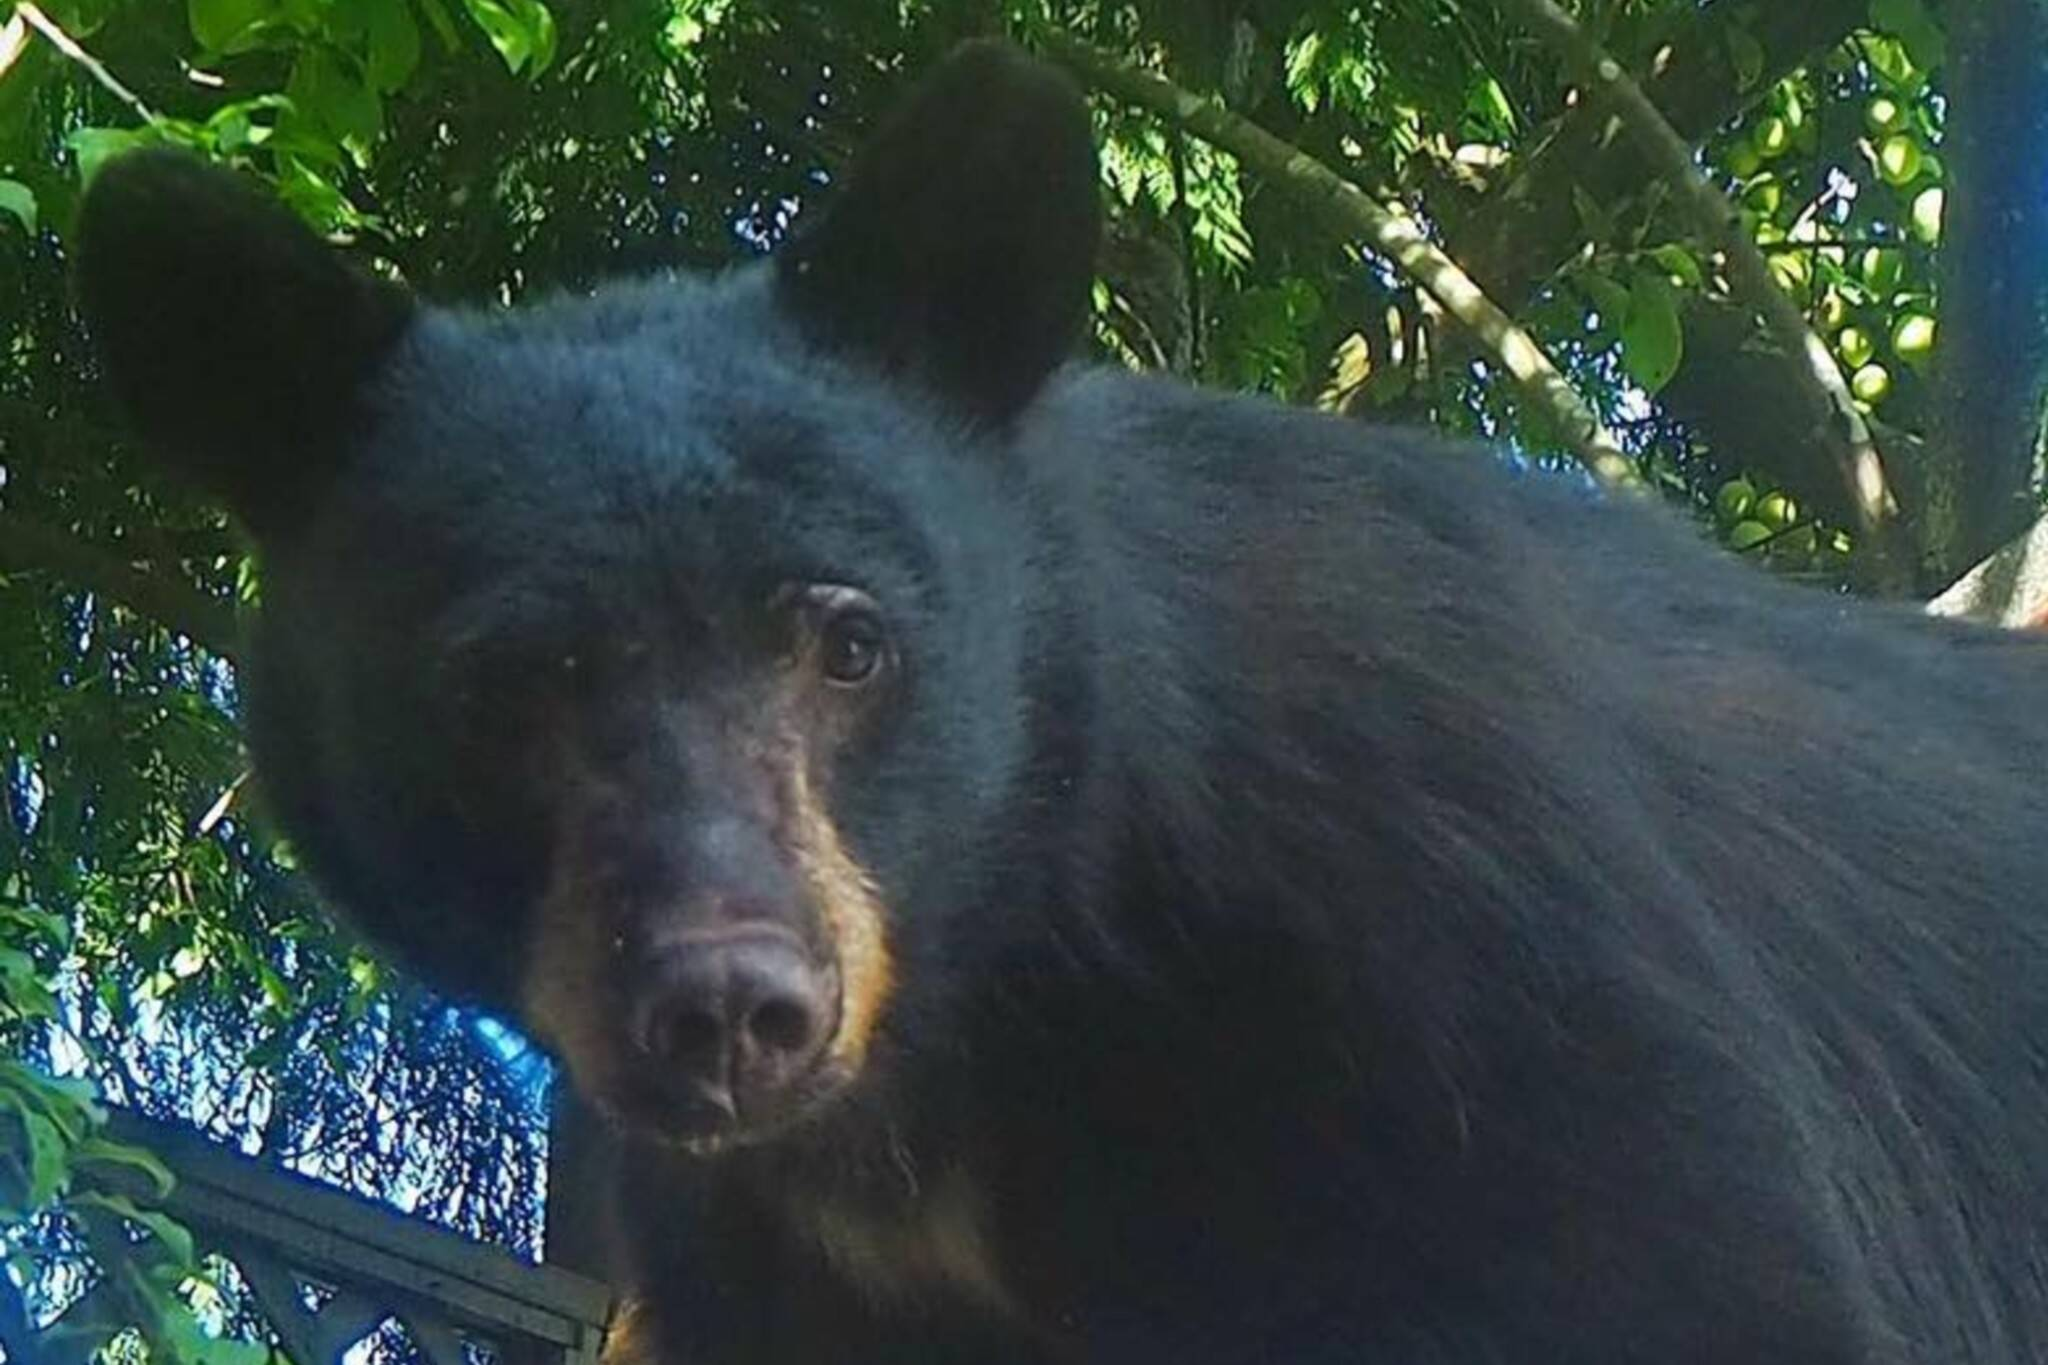 Huckleberry black bear